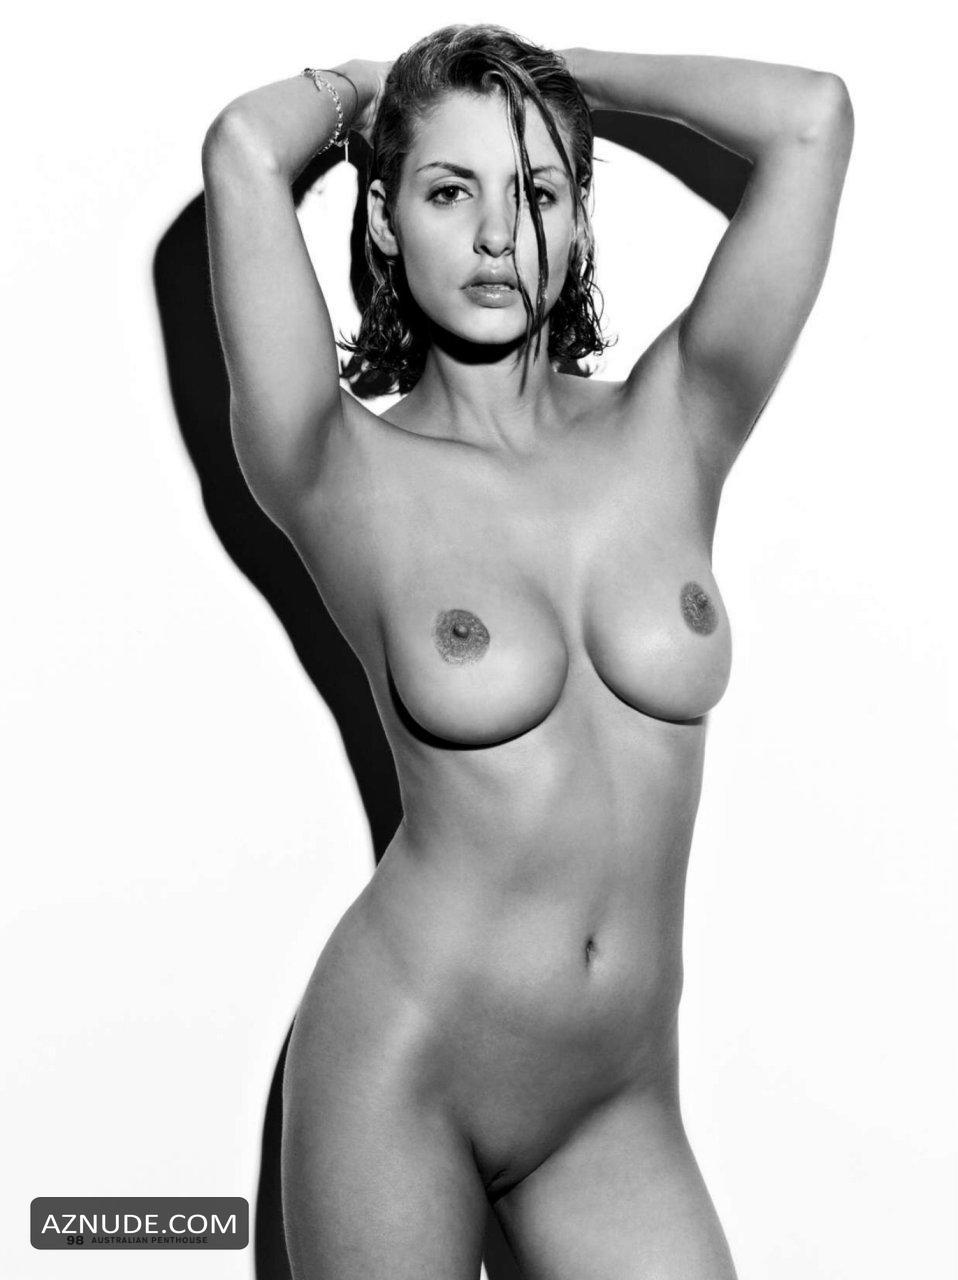 Gabi grecko naked